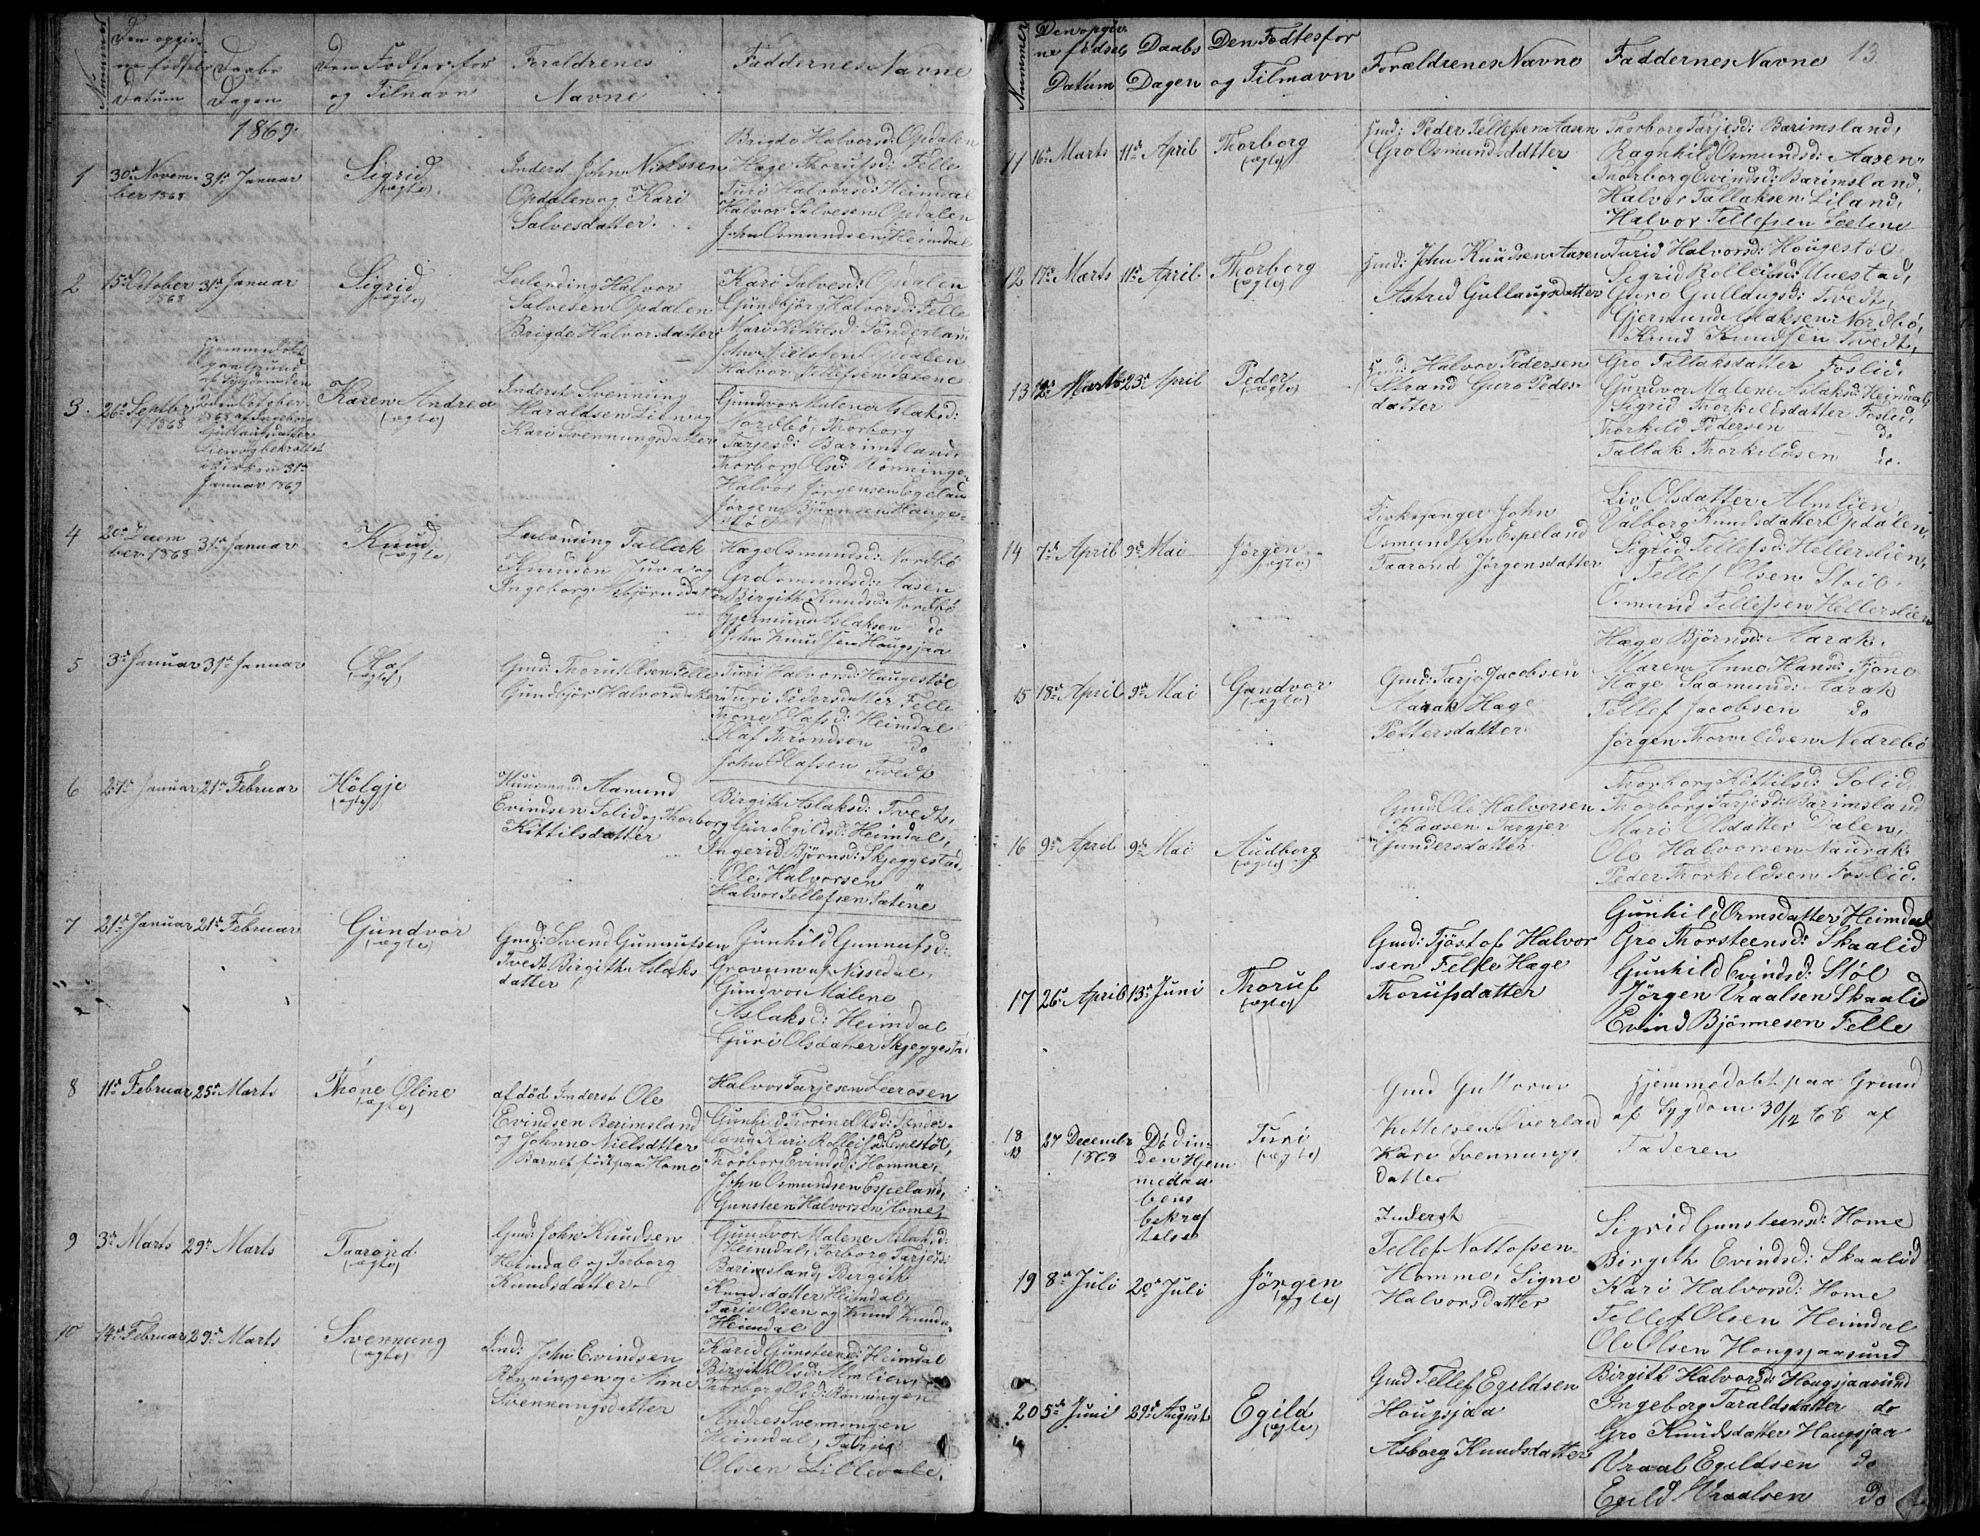 SAKO, Nissedal kirkebøker, G/Gb/L0002: Klokkerbok nr. II 2, 1863-1892, s. 13